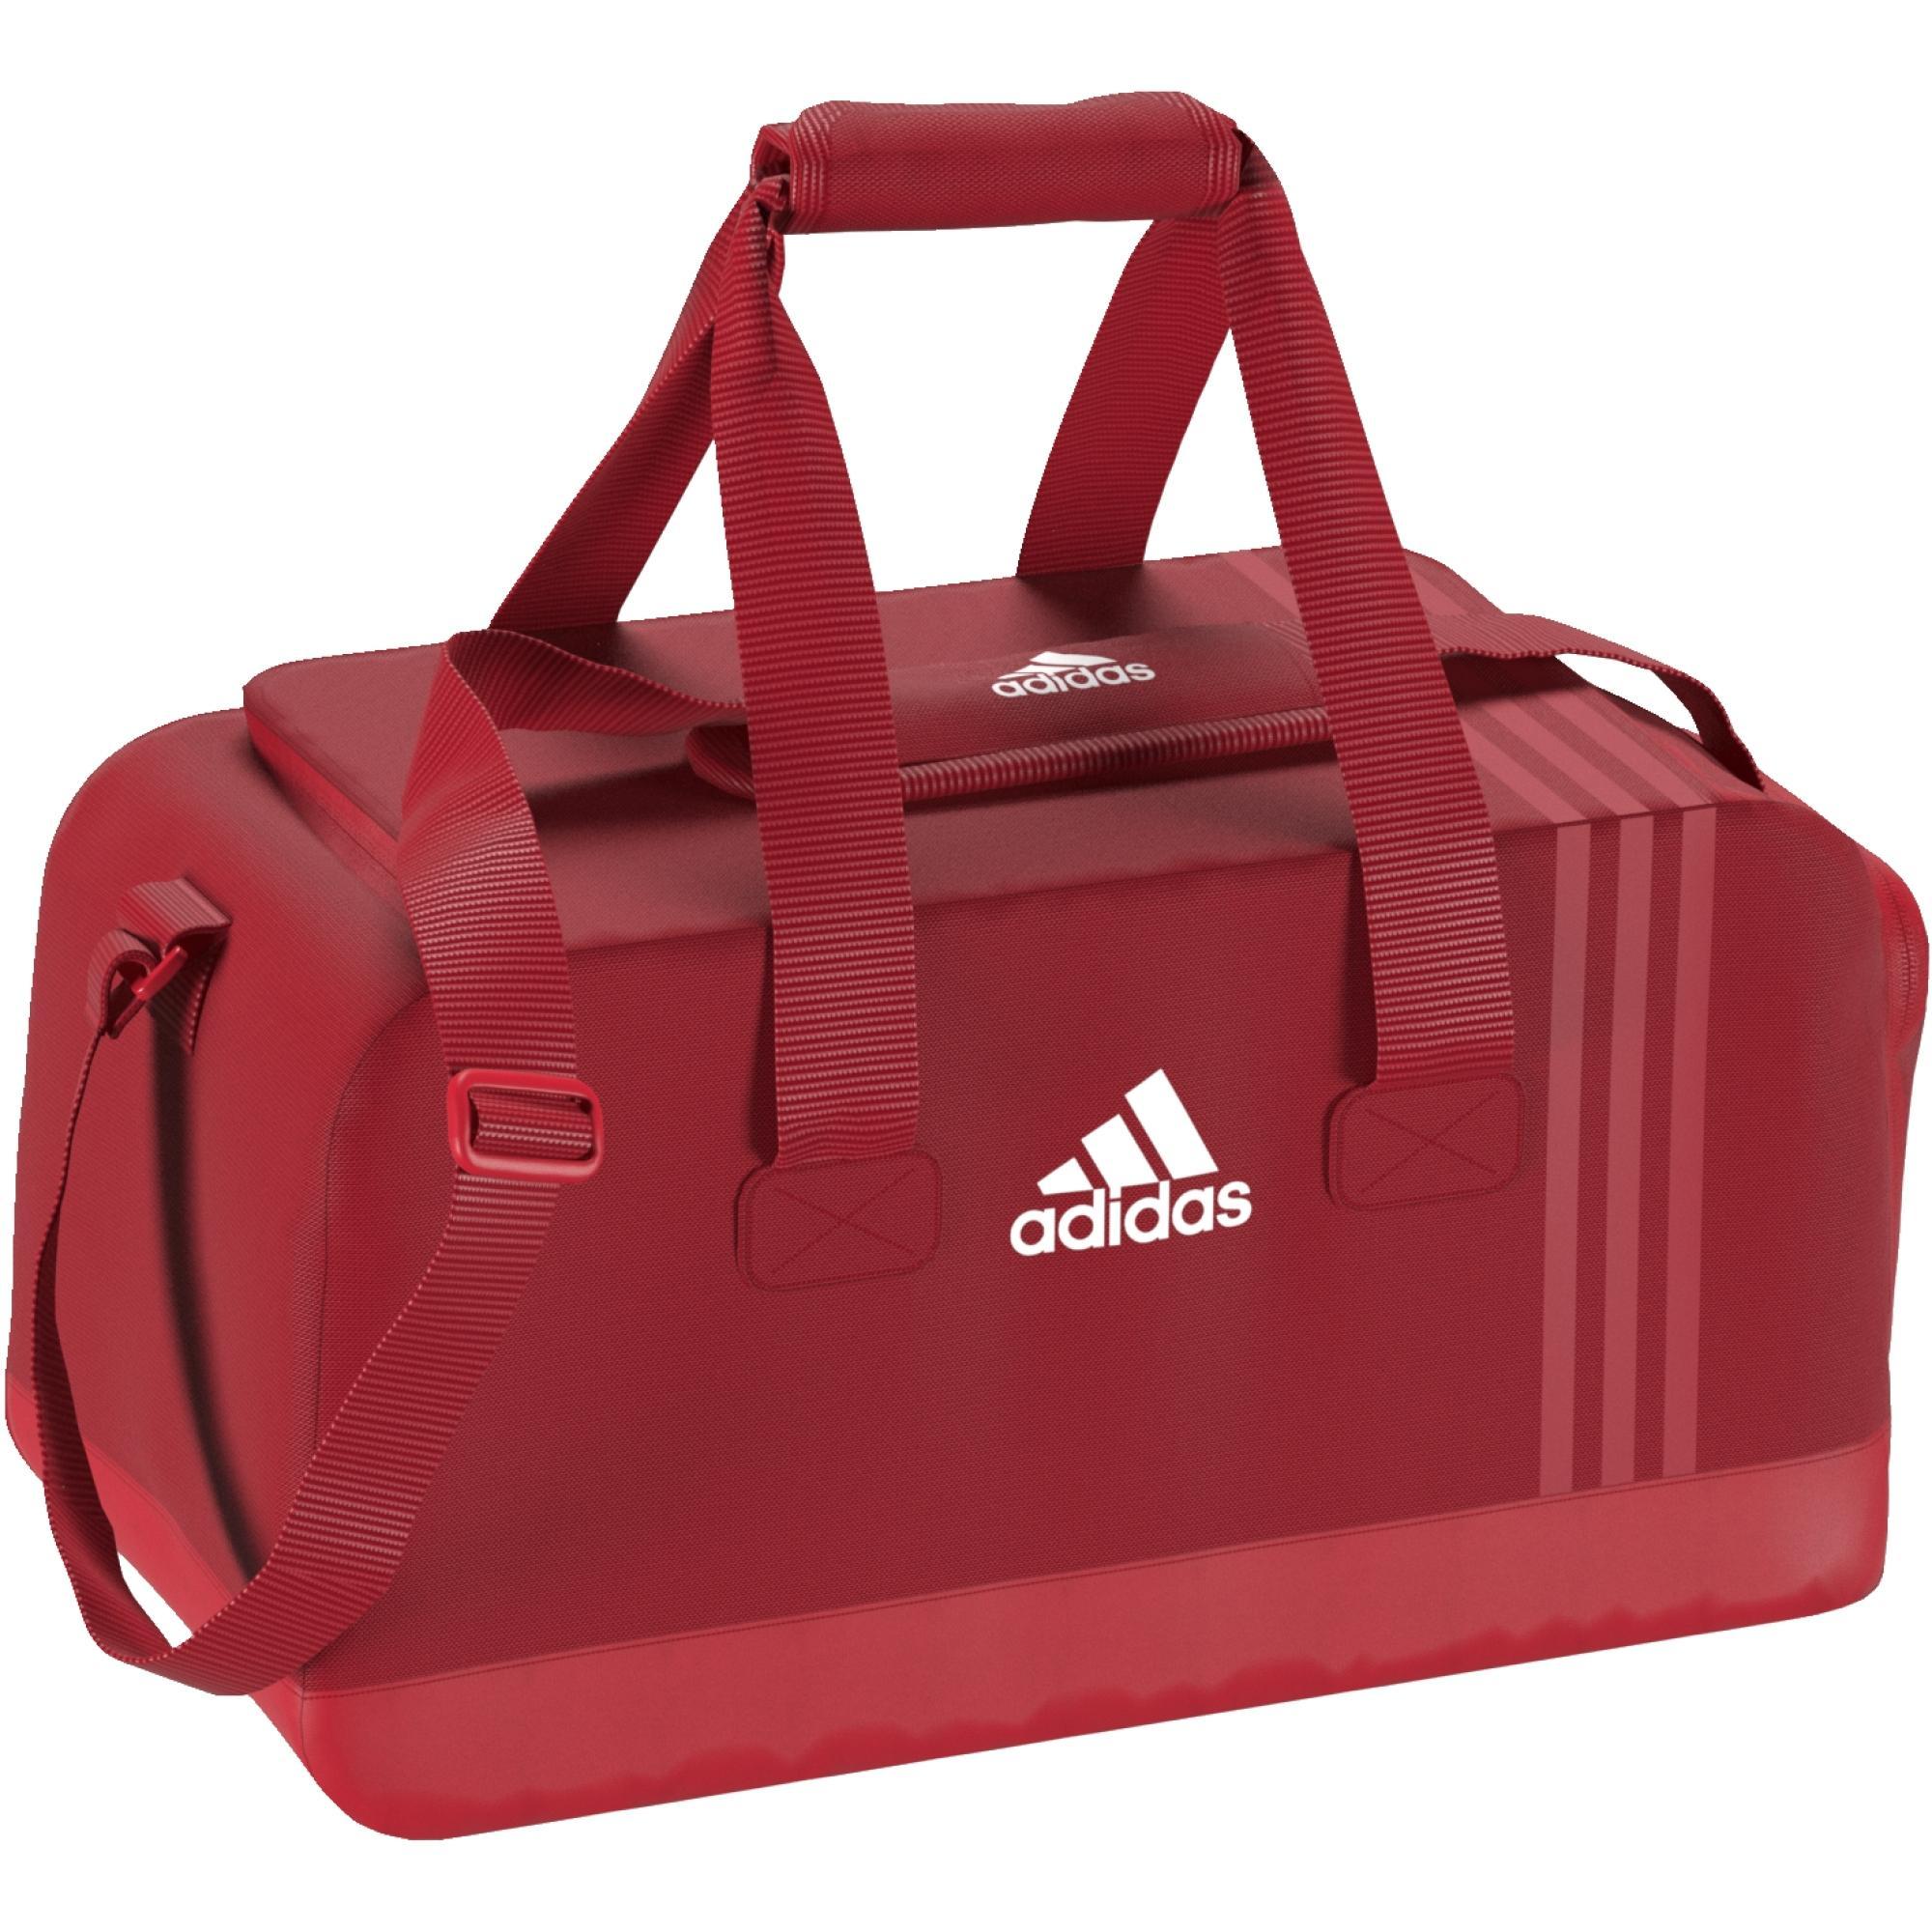 Format Sport Adidas Petit Sac Tiro De 3Aj54qLR